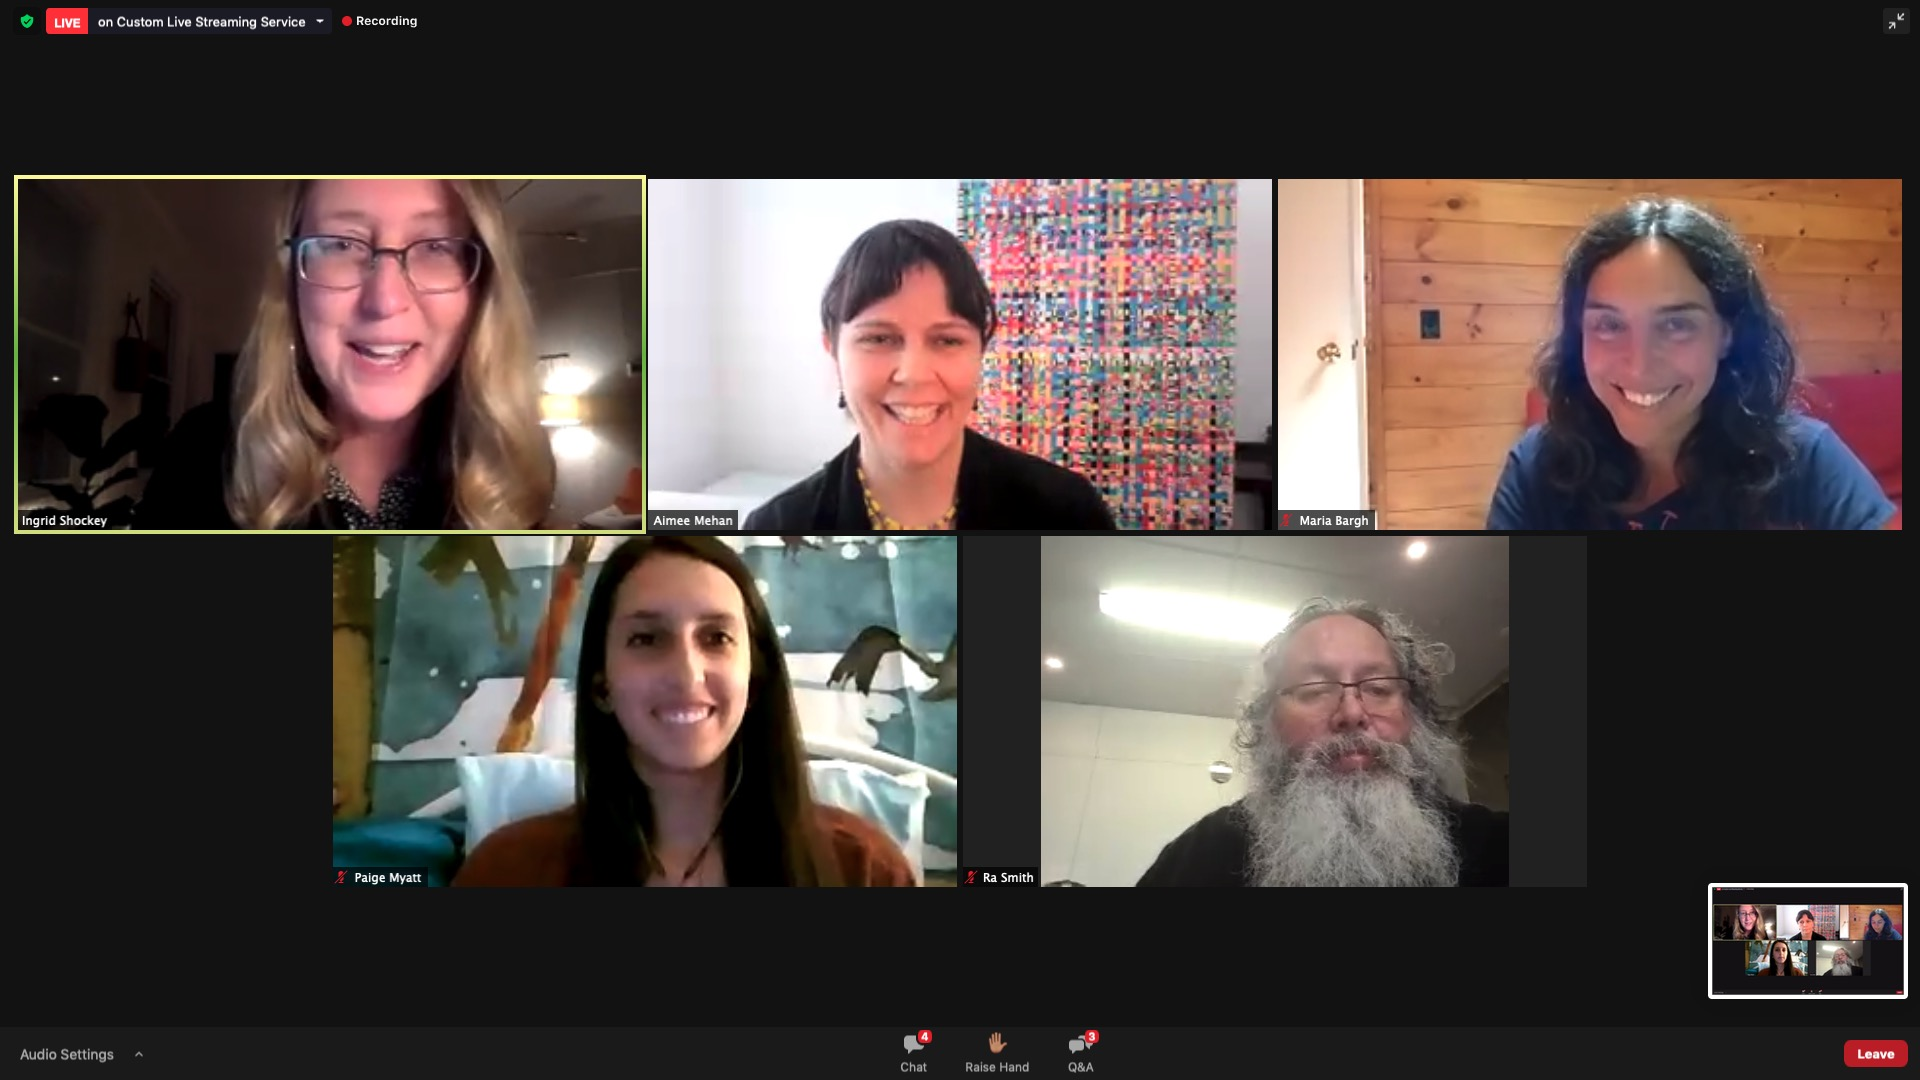 Panelists: Ingrid Shockey, Aimee Mehan, Maria Bargh, Paige Myatt, Ra Smith alt